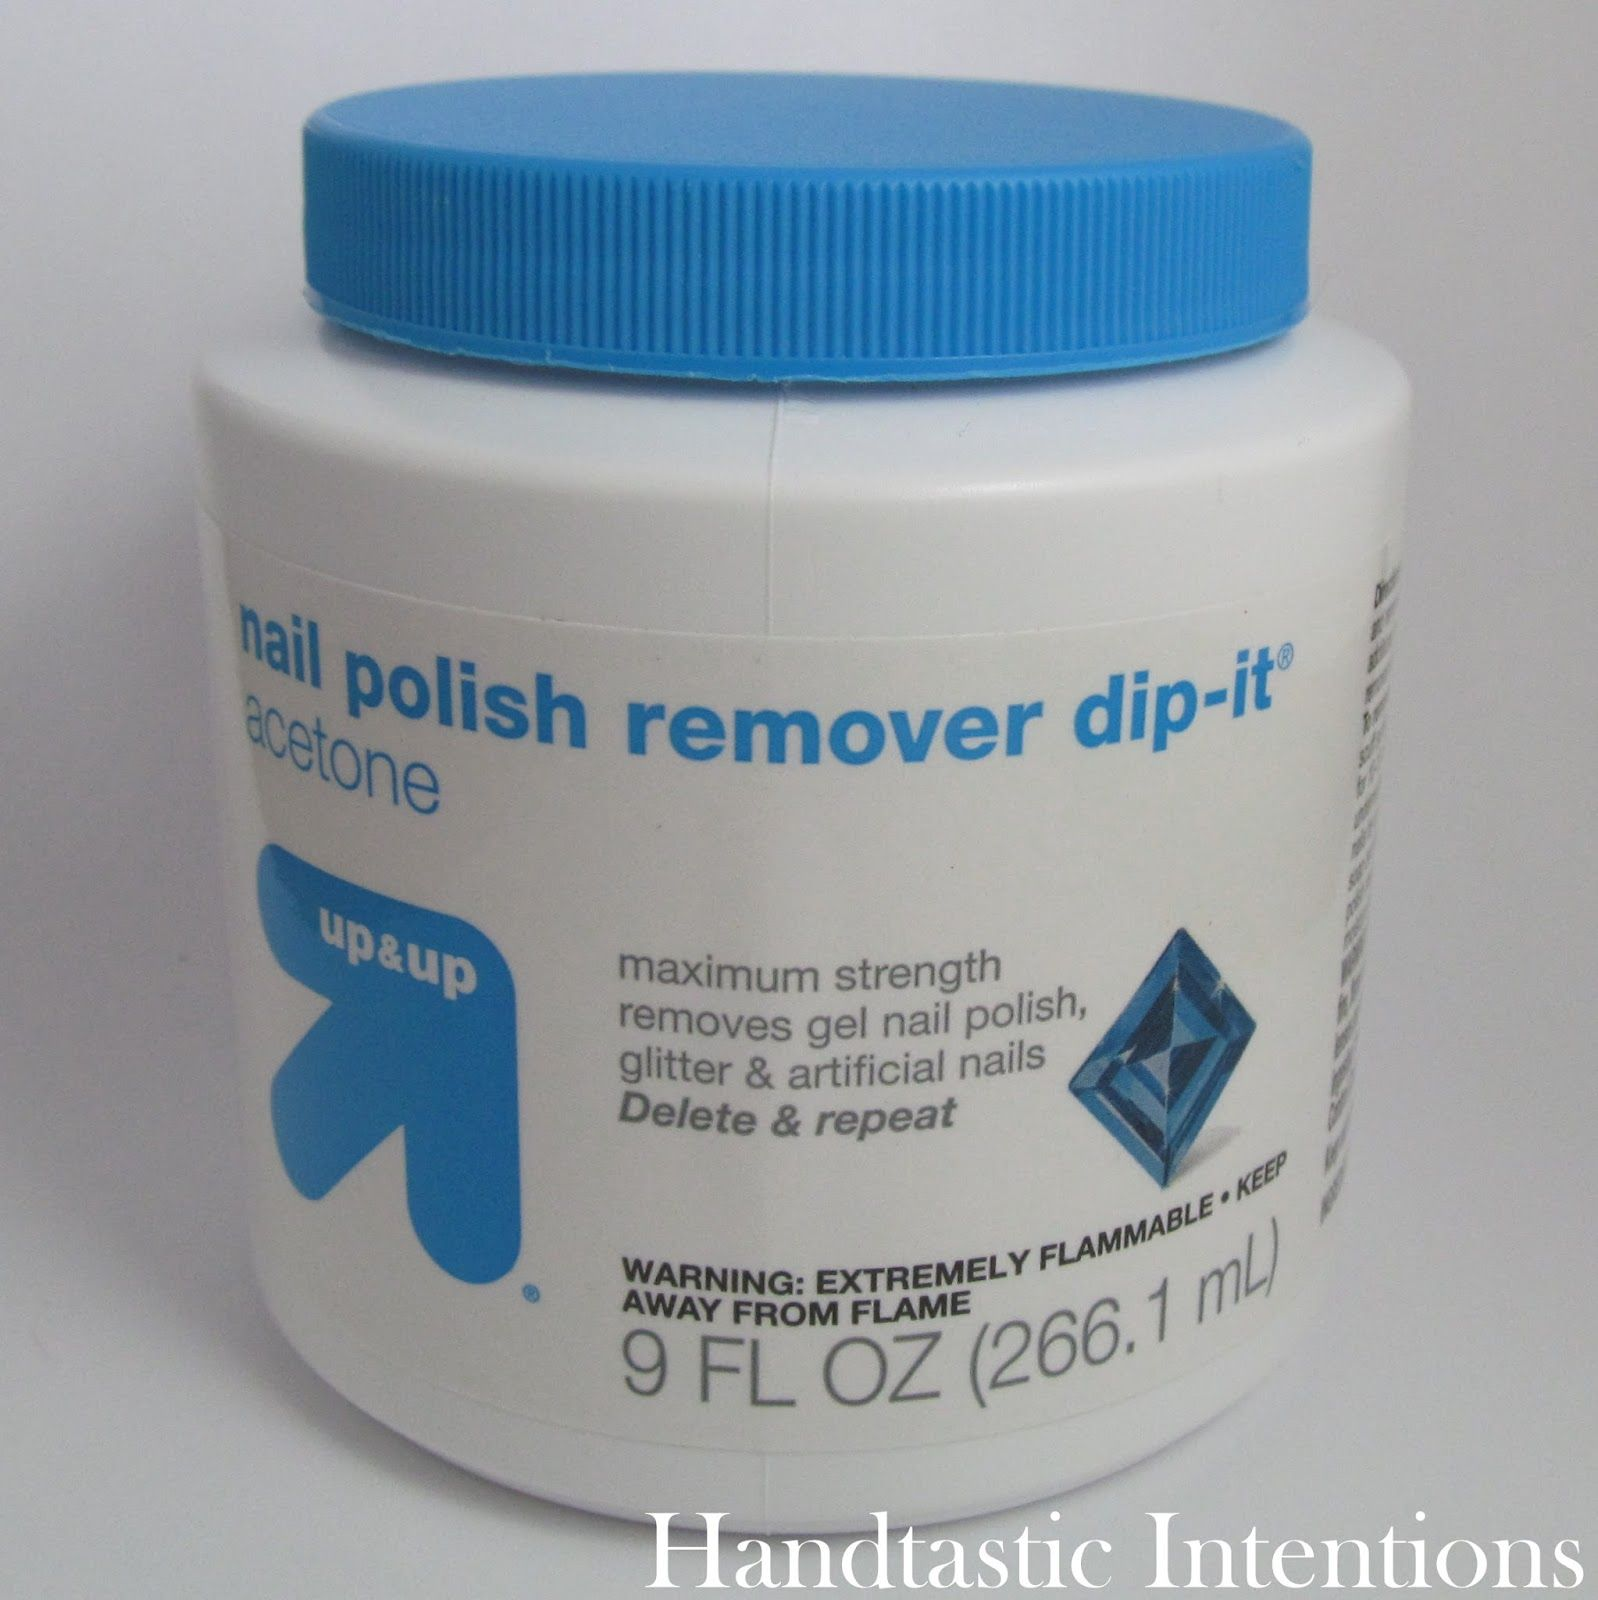 Handtastic Intentions: Nail Care Product Review: Up&Up Nail Polish ...